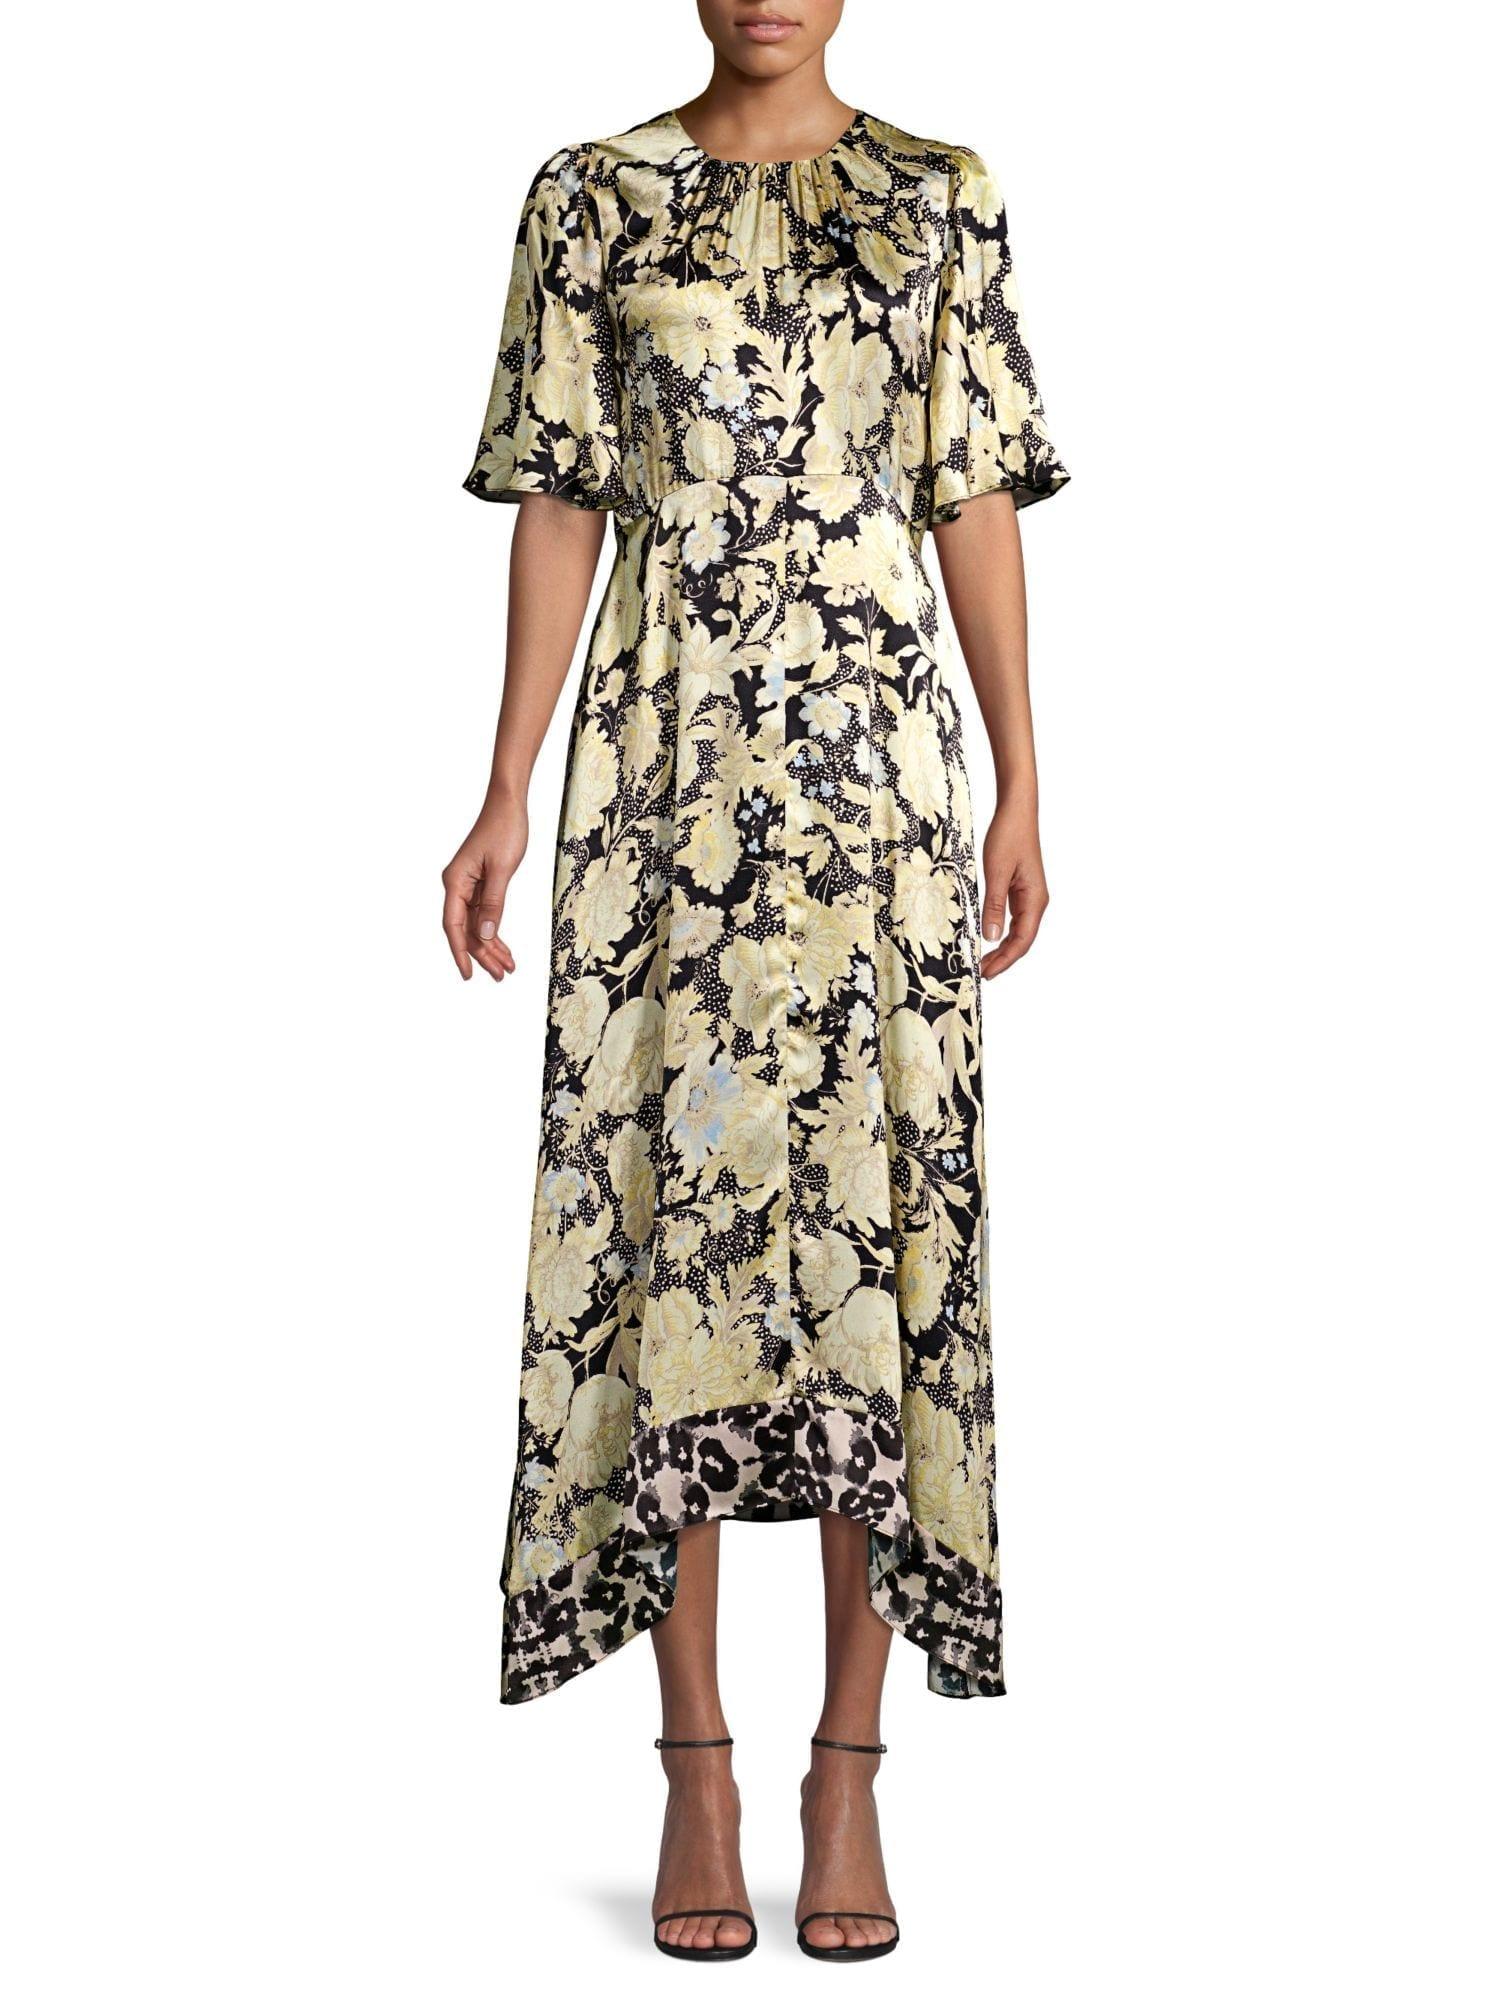 REBECCA TAYLOR Floral Handkerchief Silk Dress